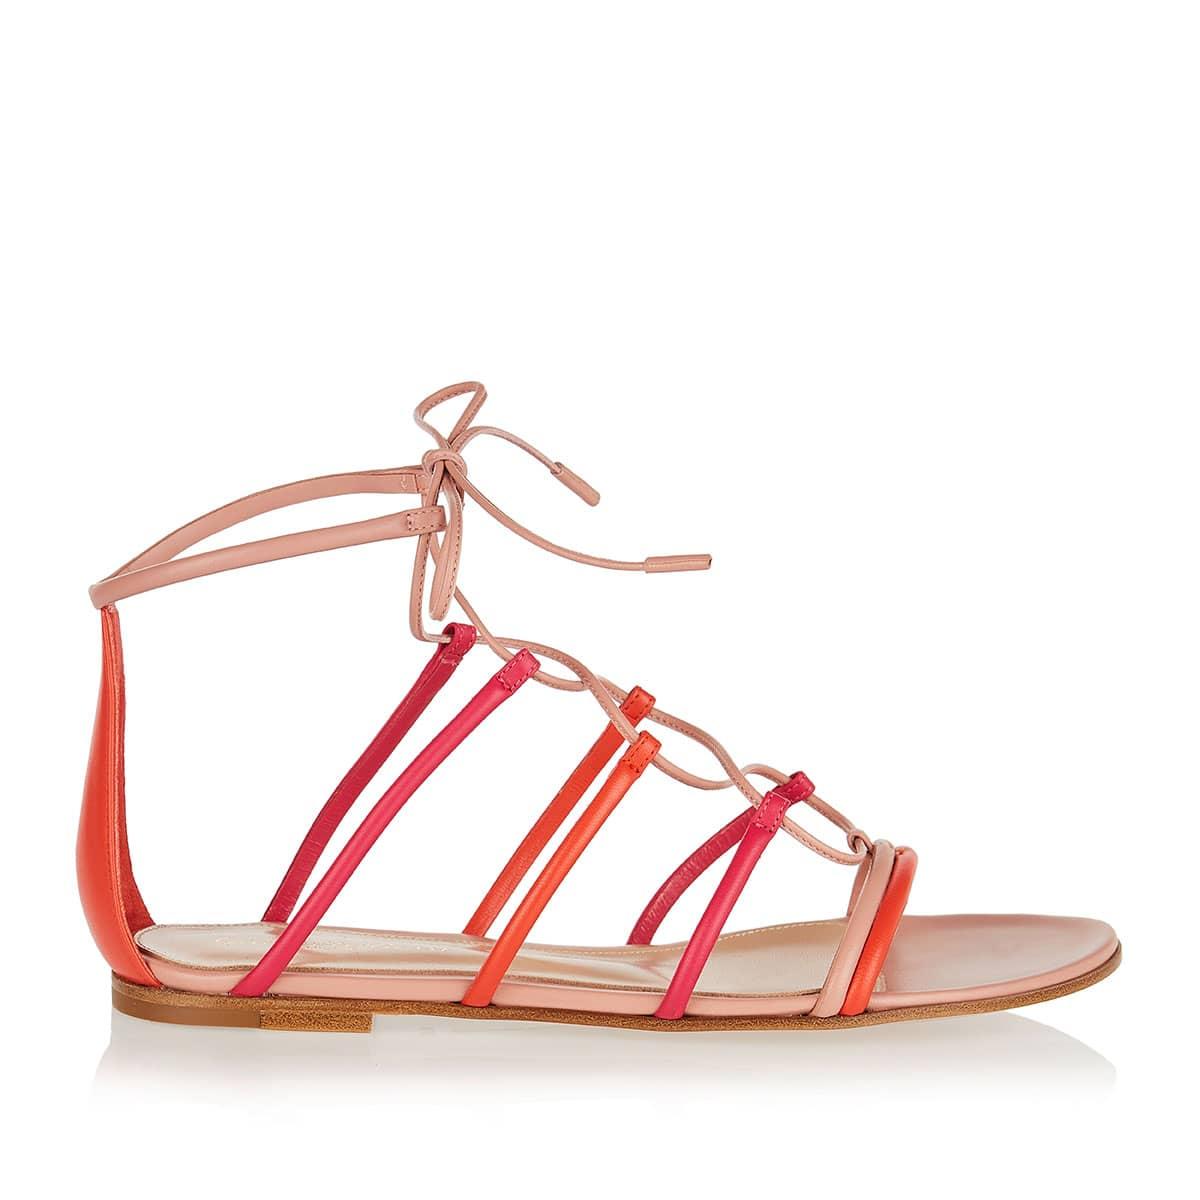 Gladiator flat leather sandals